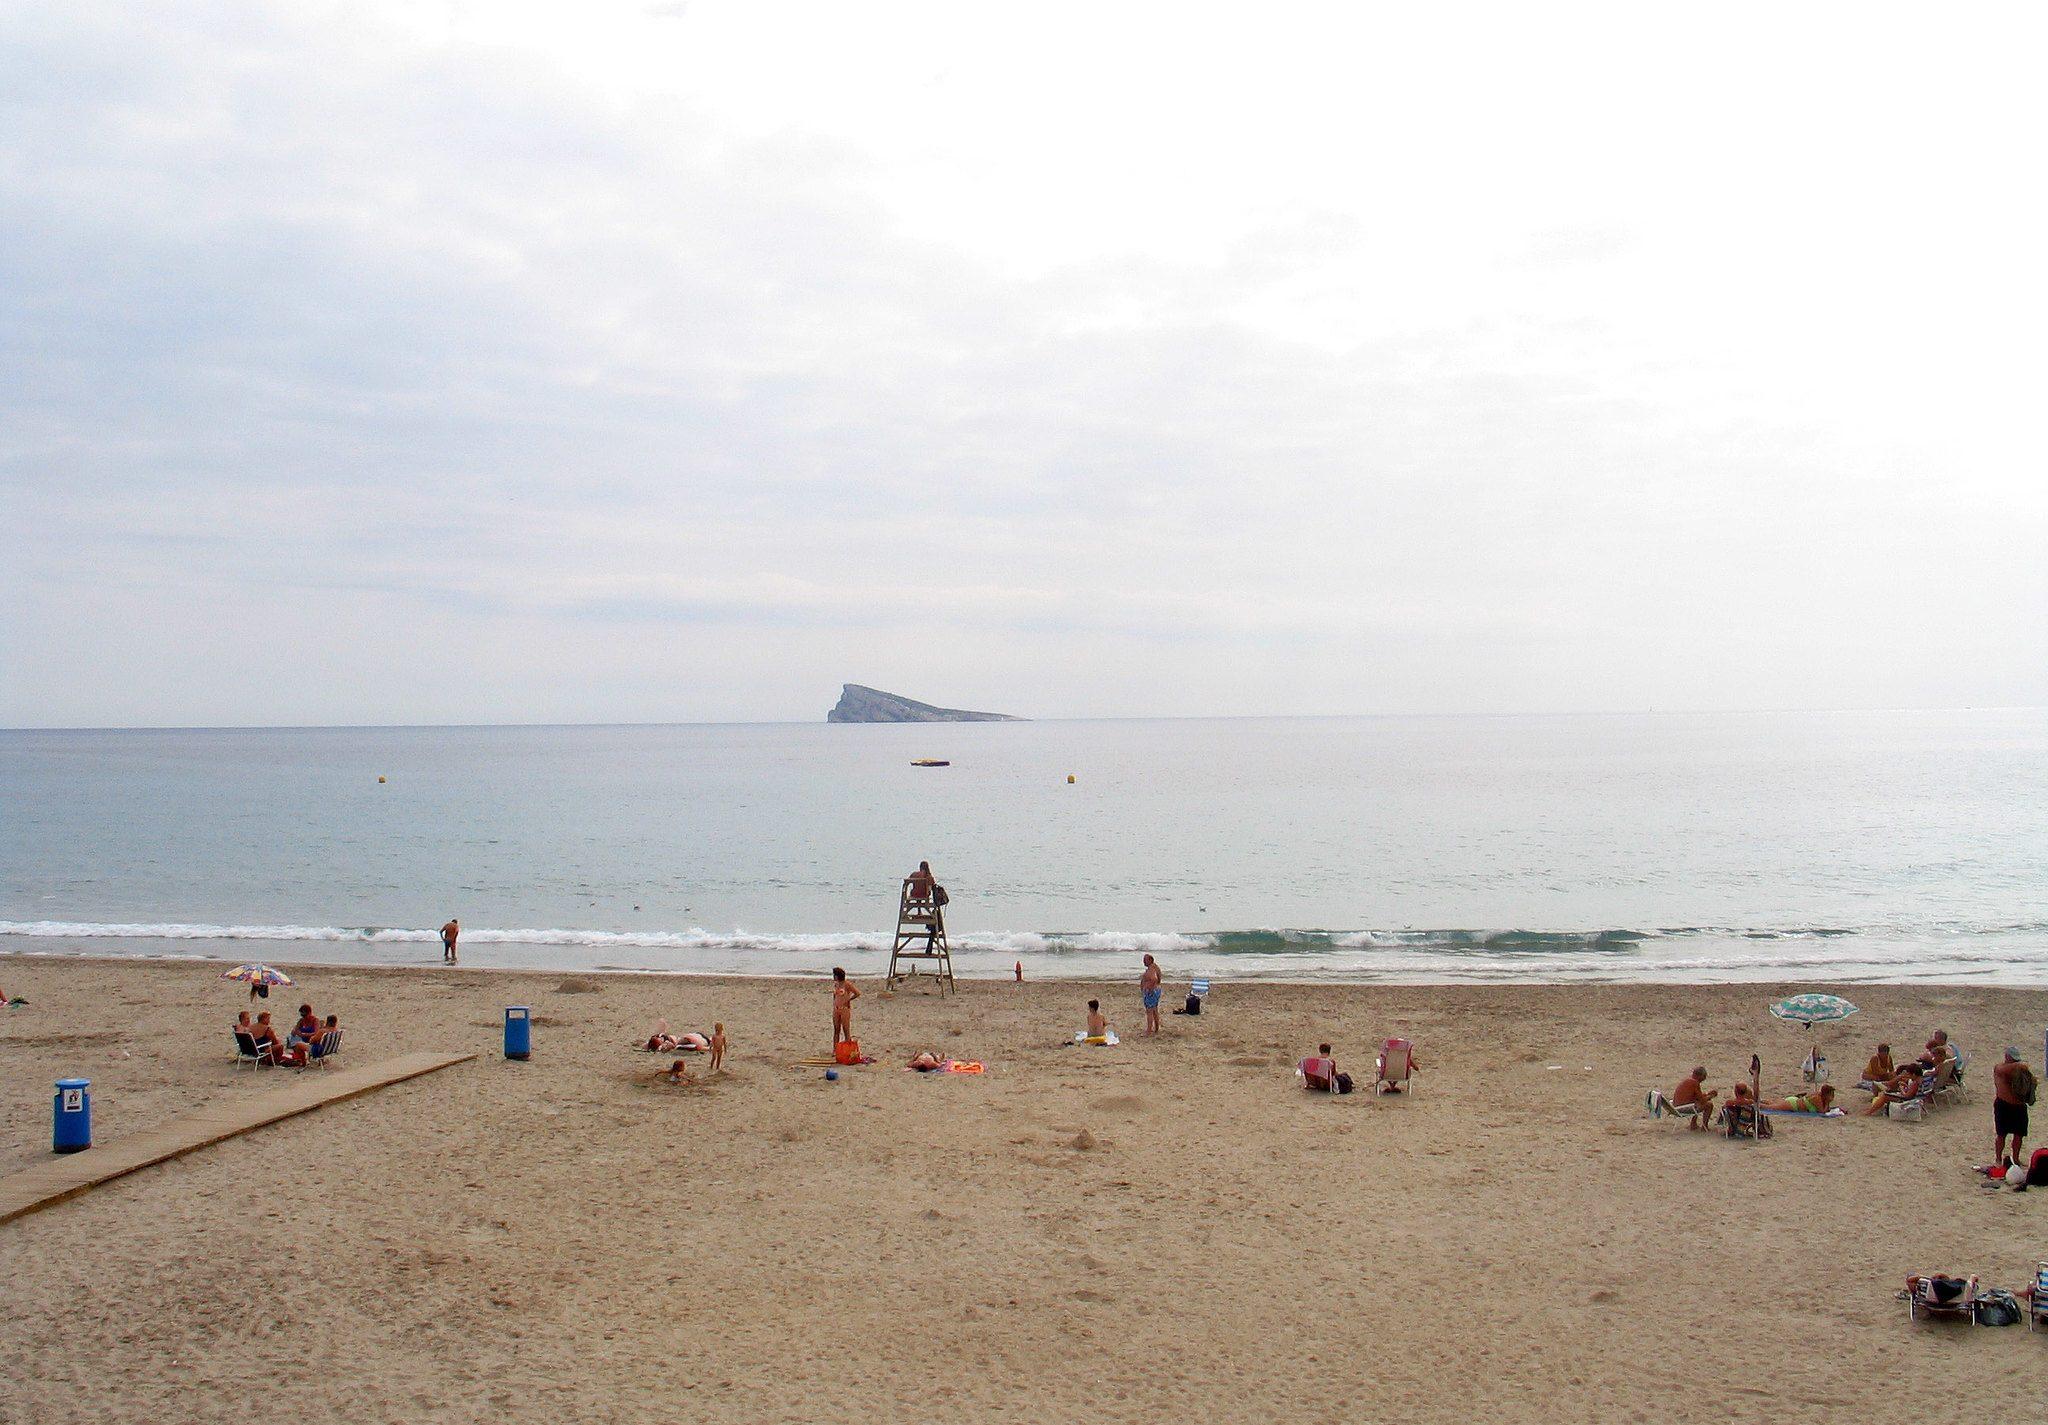 15 Best Things To Do in Benidorm, Spain